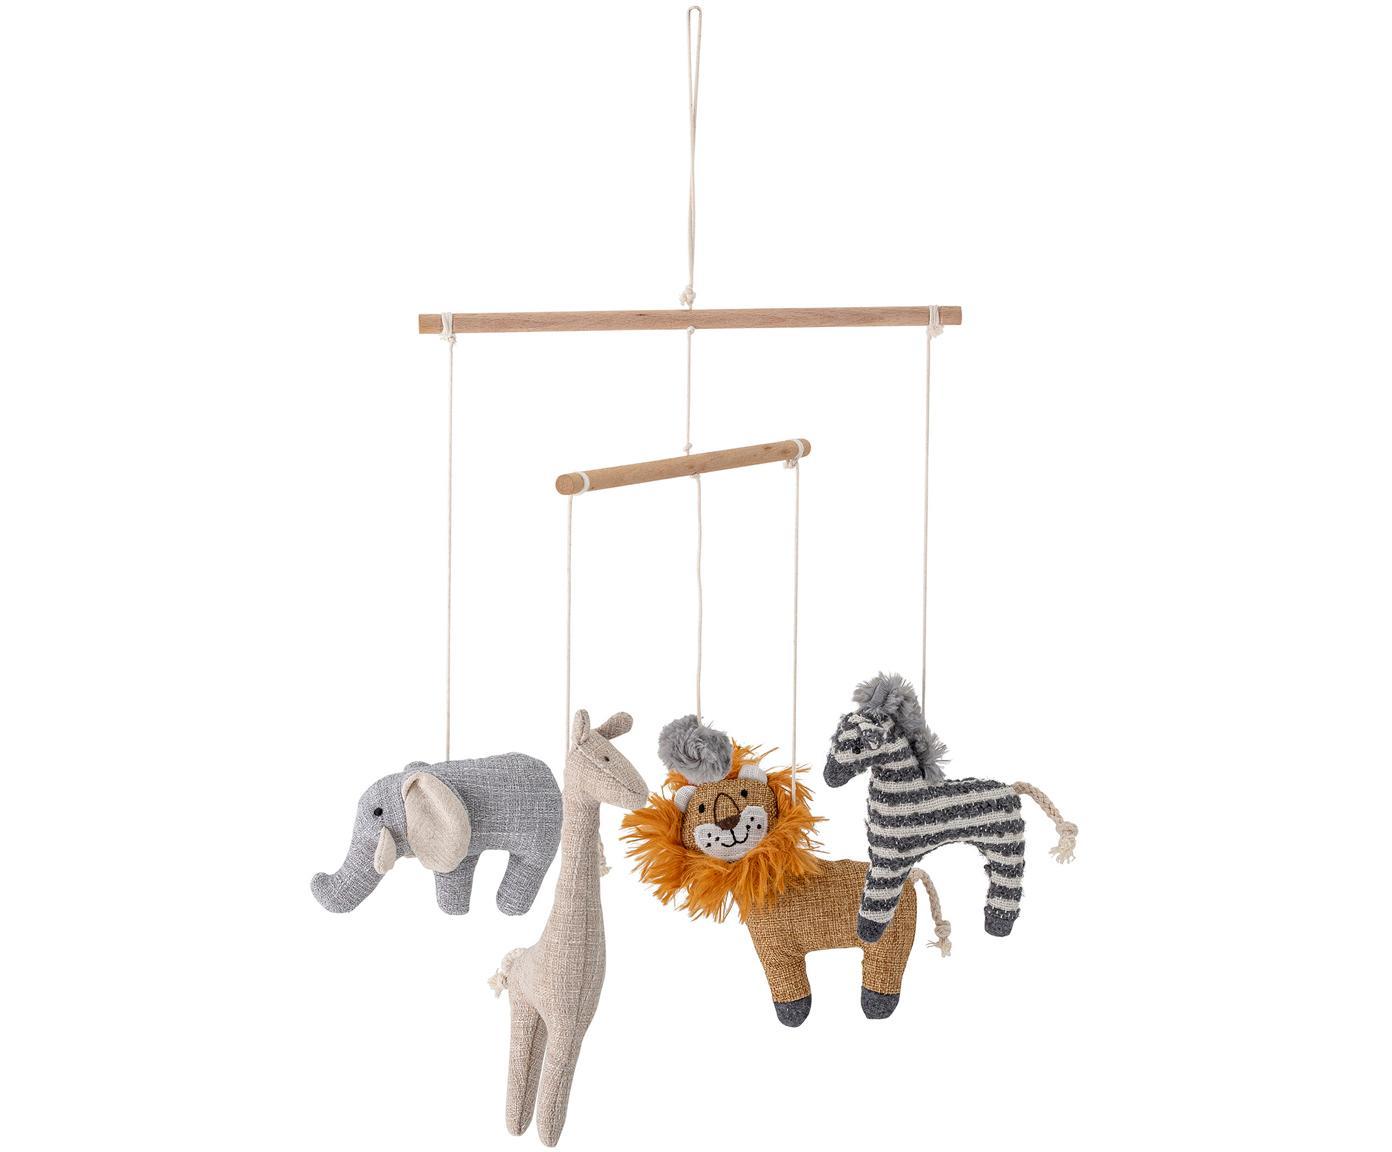 Móvil bebé Animals, Poliéster, lino, madera de abedul, Multicolor, Ø 26 x Al 31 cm